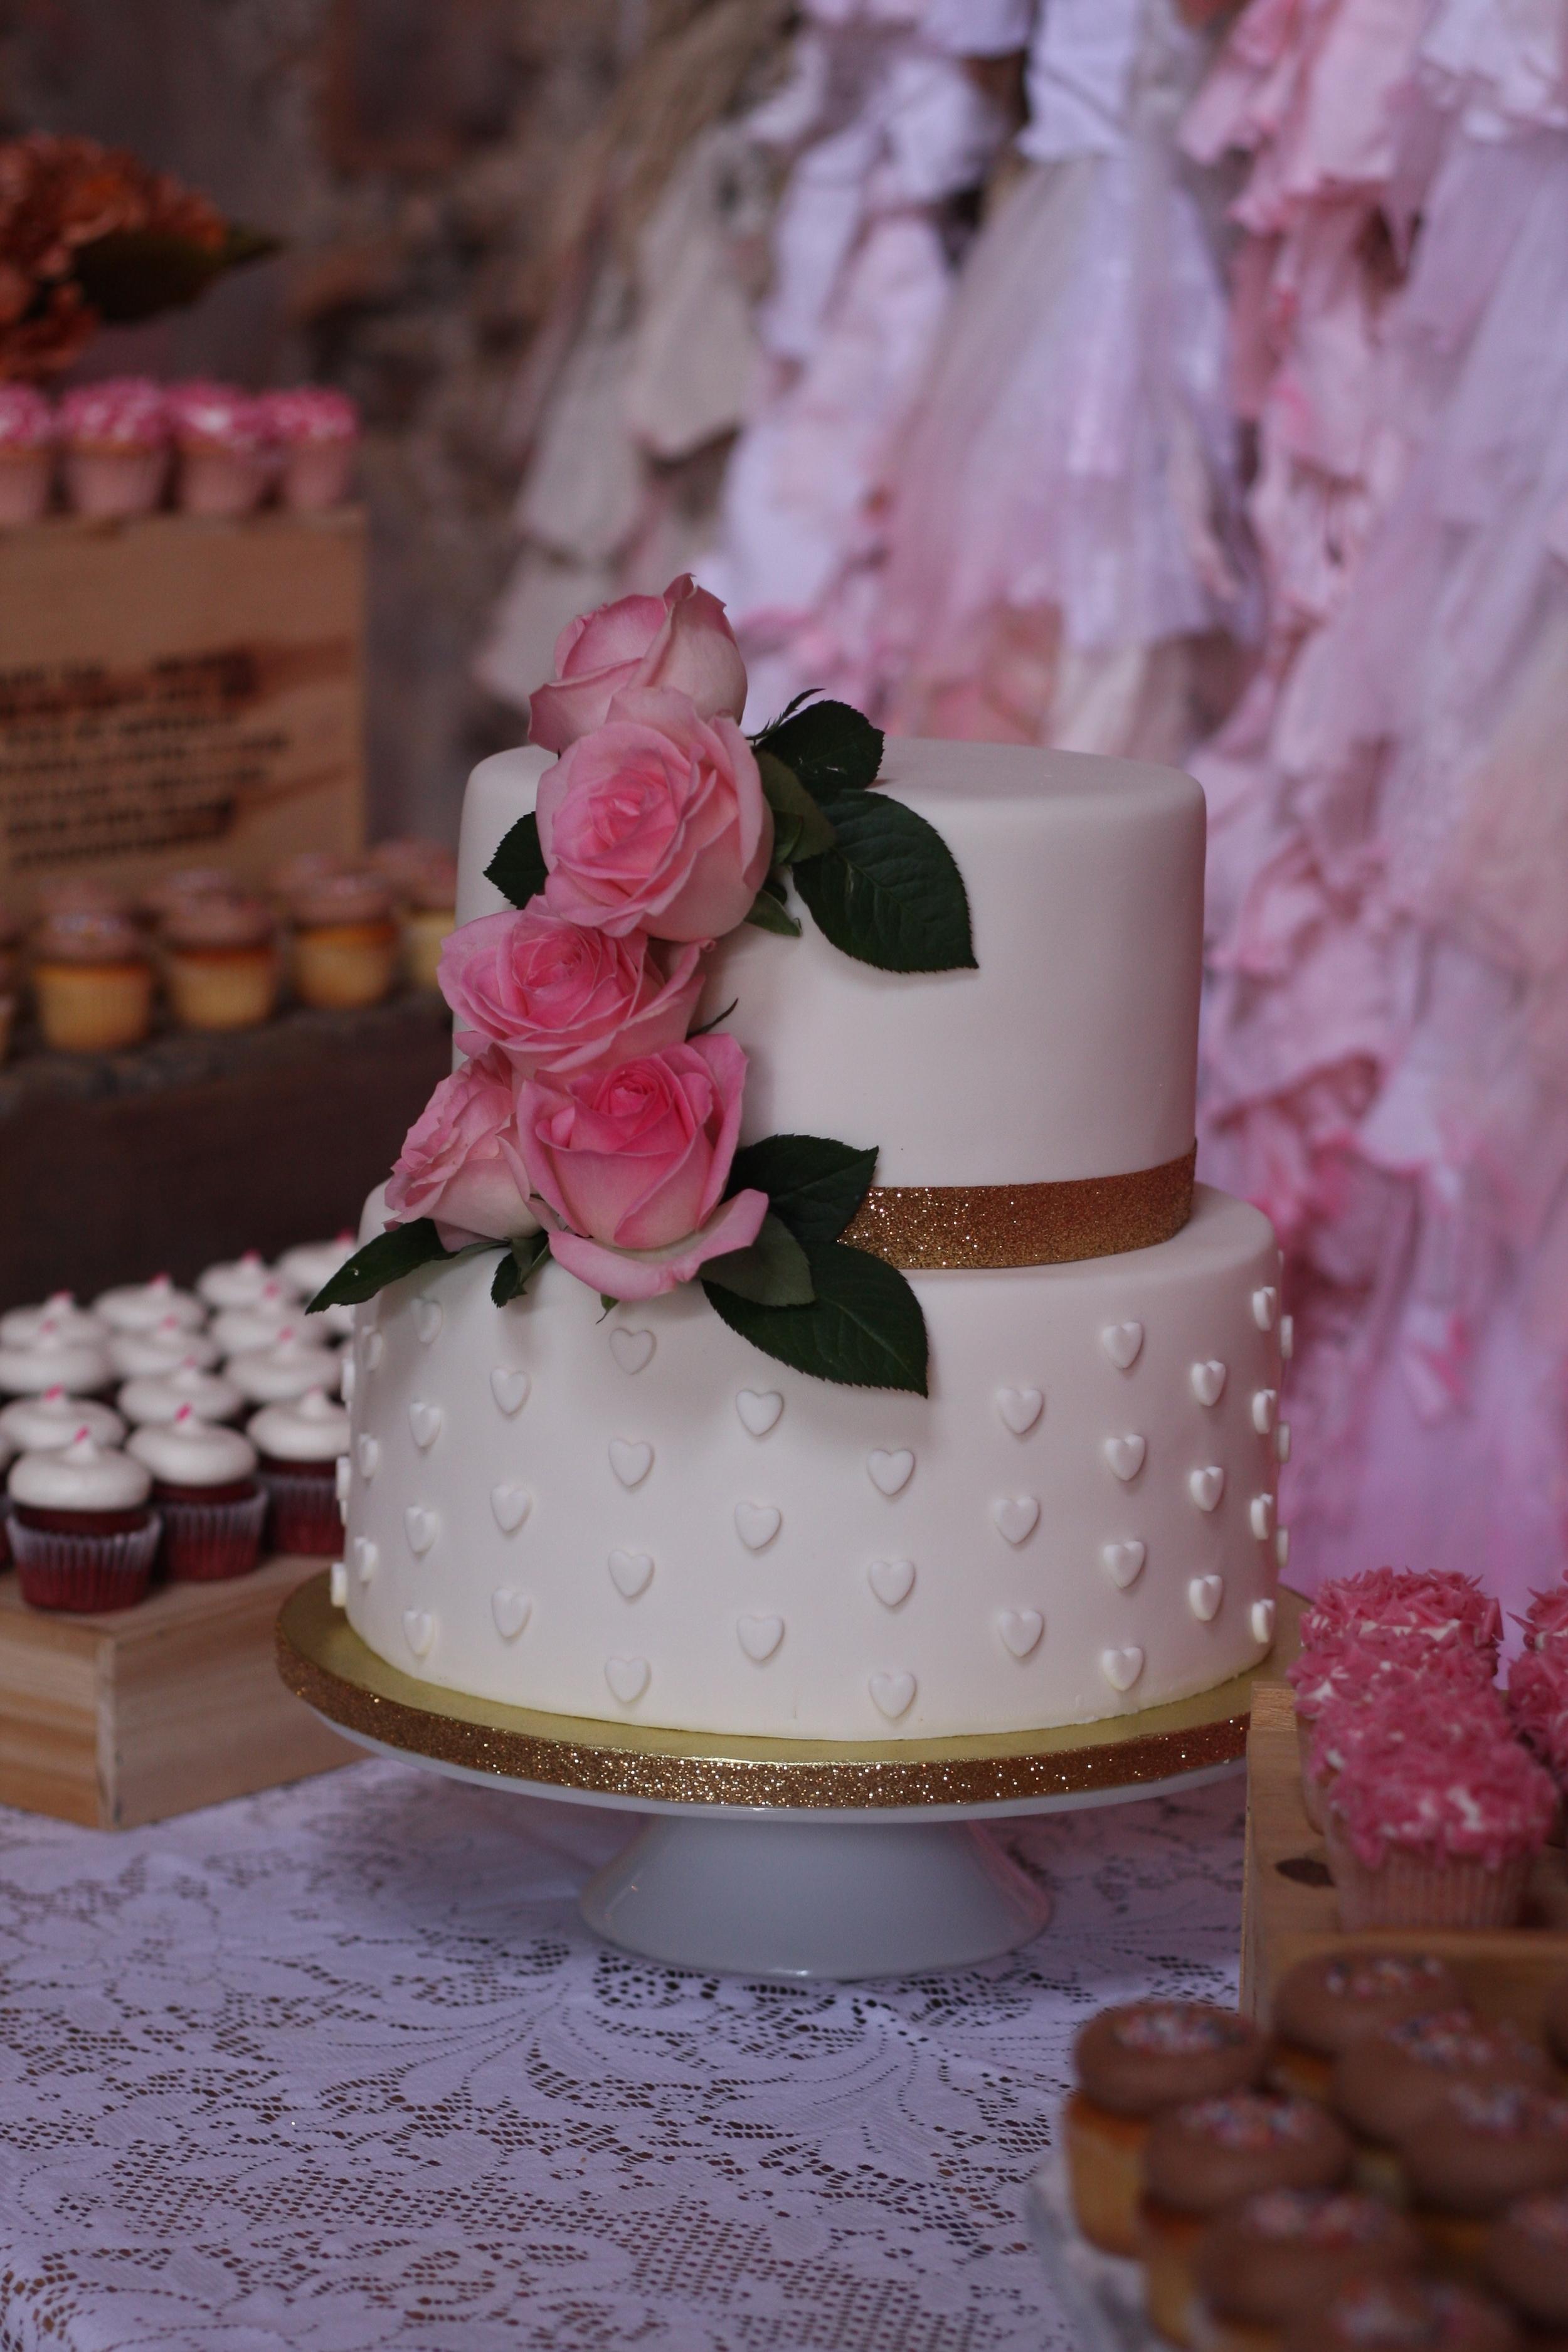 Wedding Cake with Fondant Details